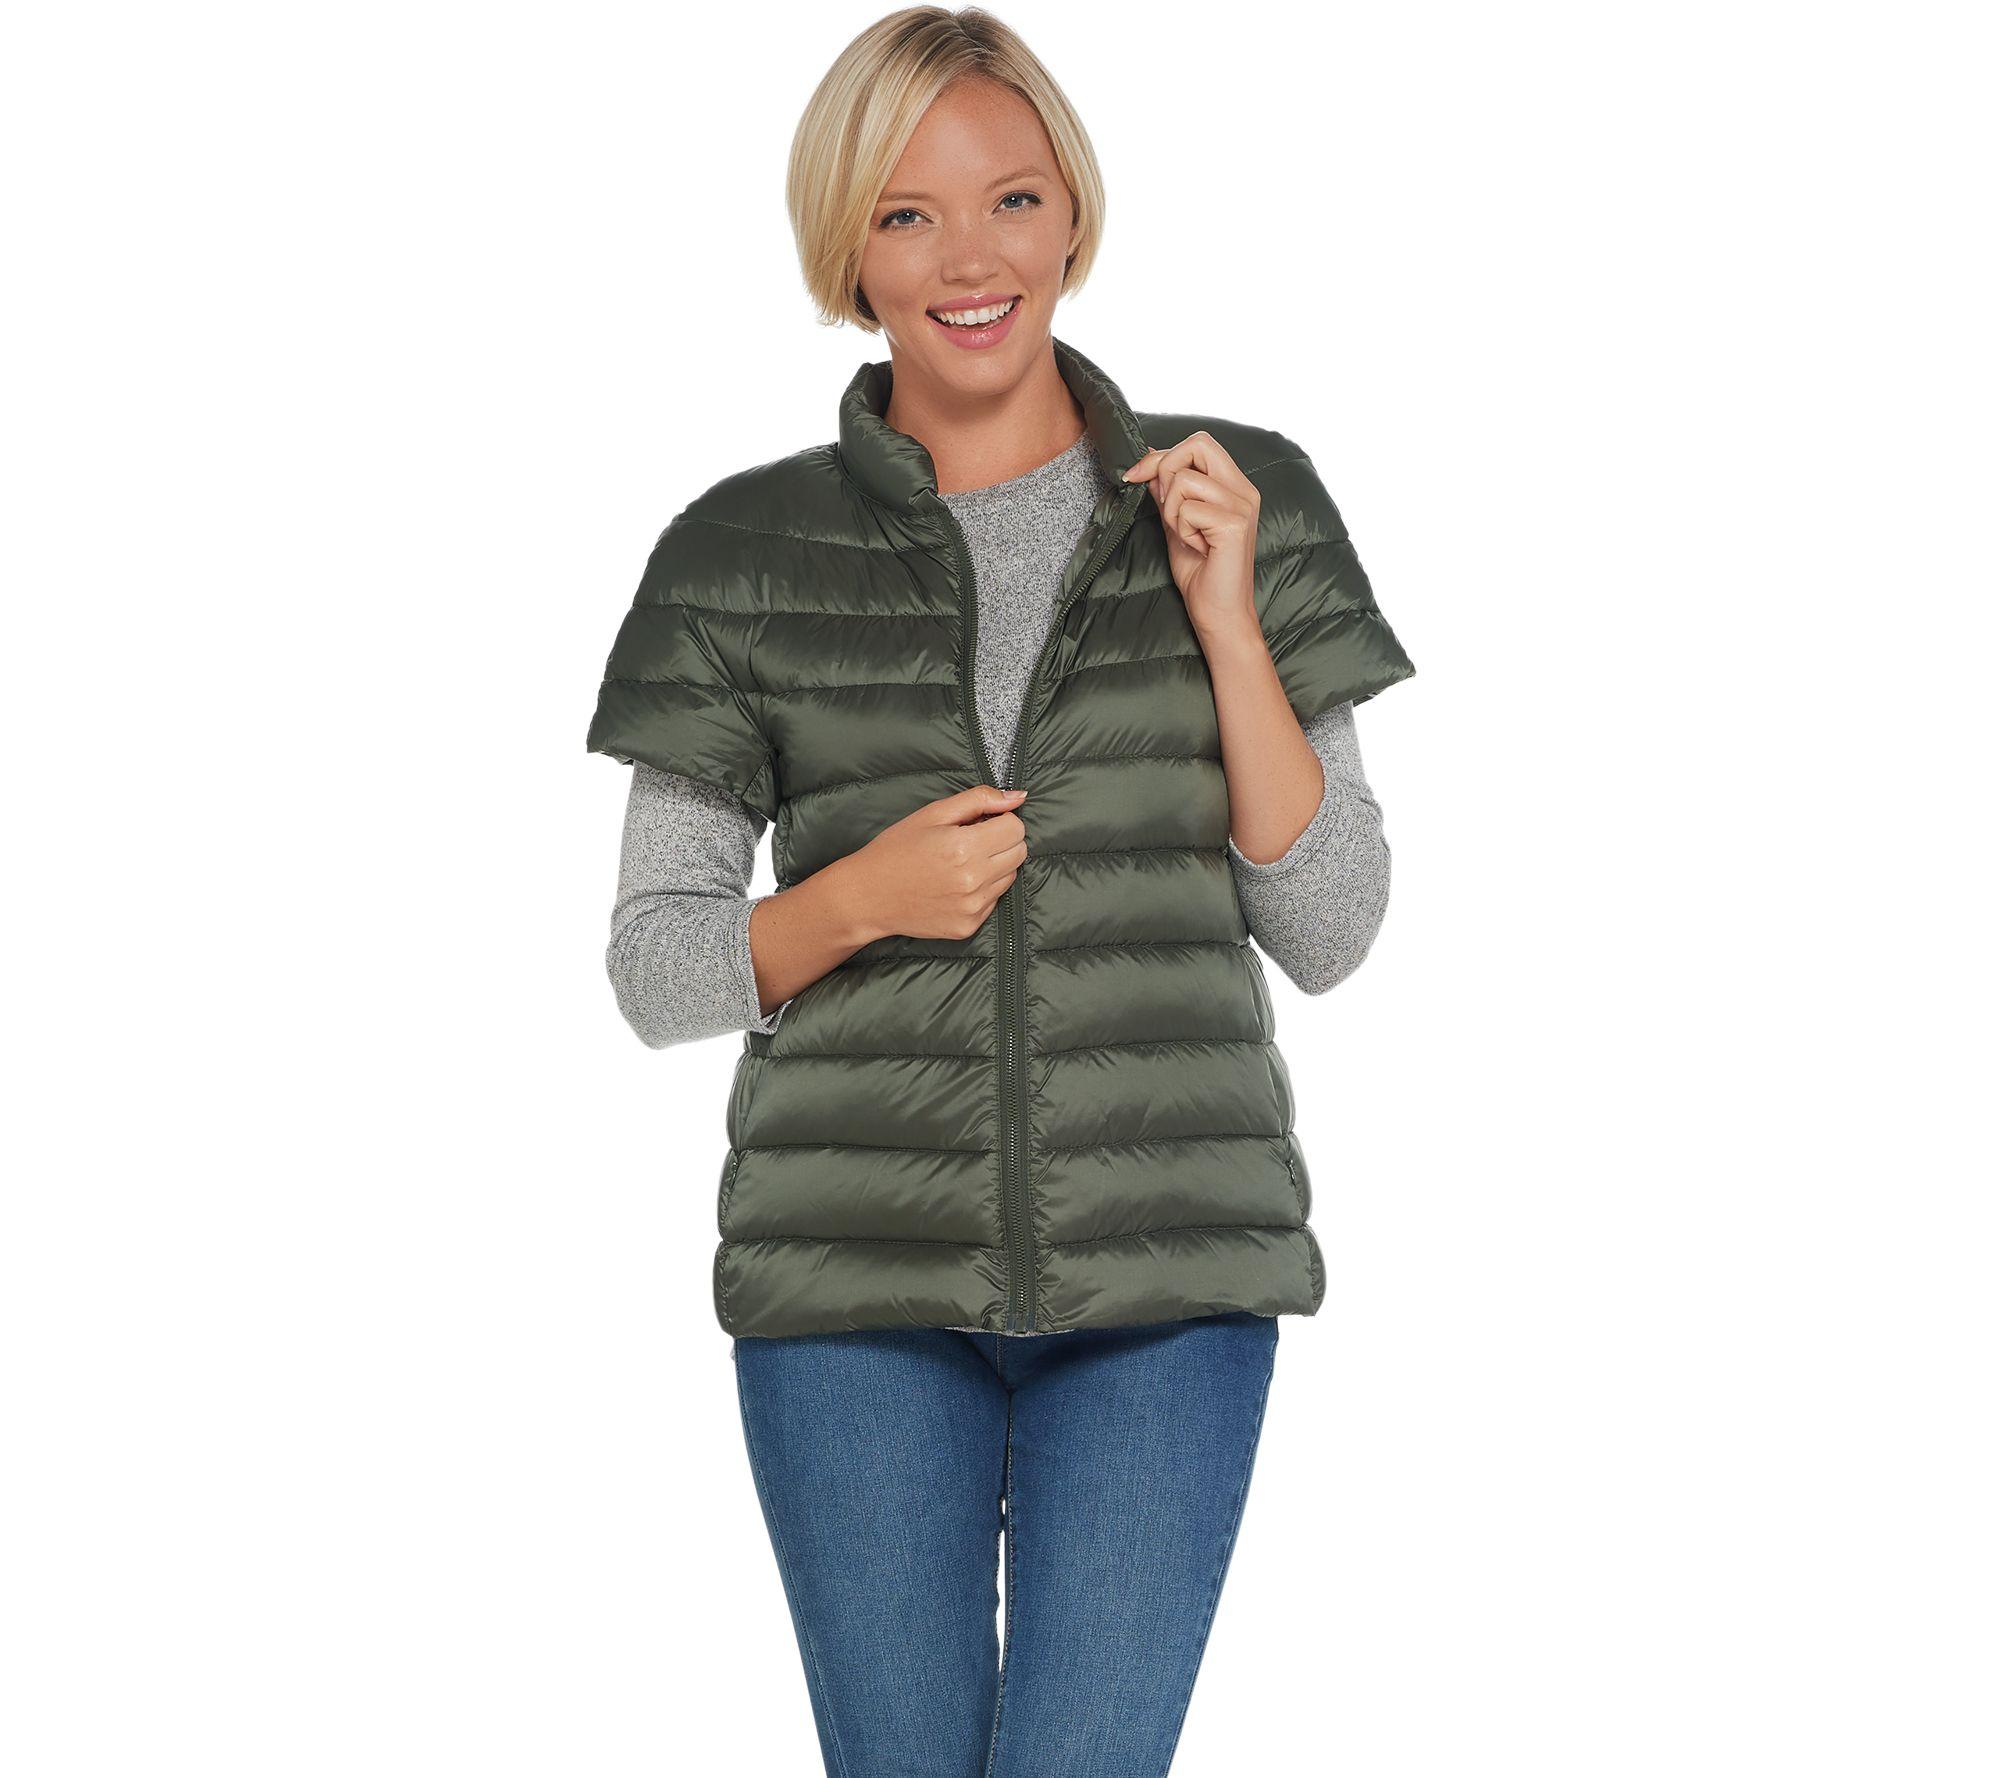 d156955a458de Martha Stewart Quilted Down Short Sleeve Puffer Jacket - Page 1 — QVC.com